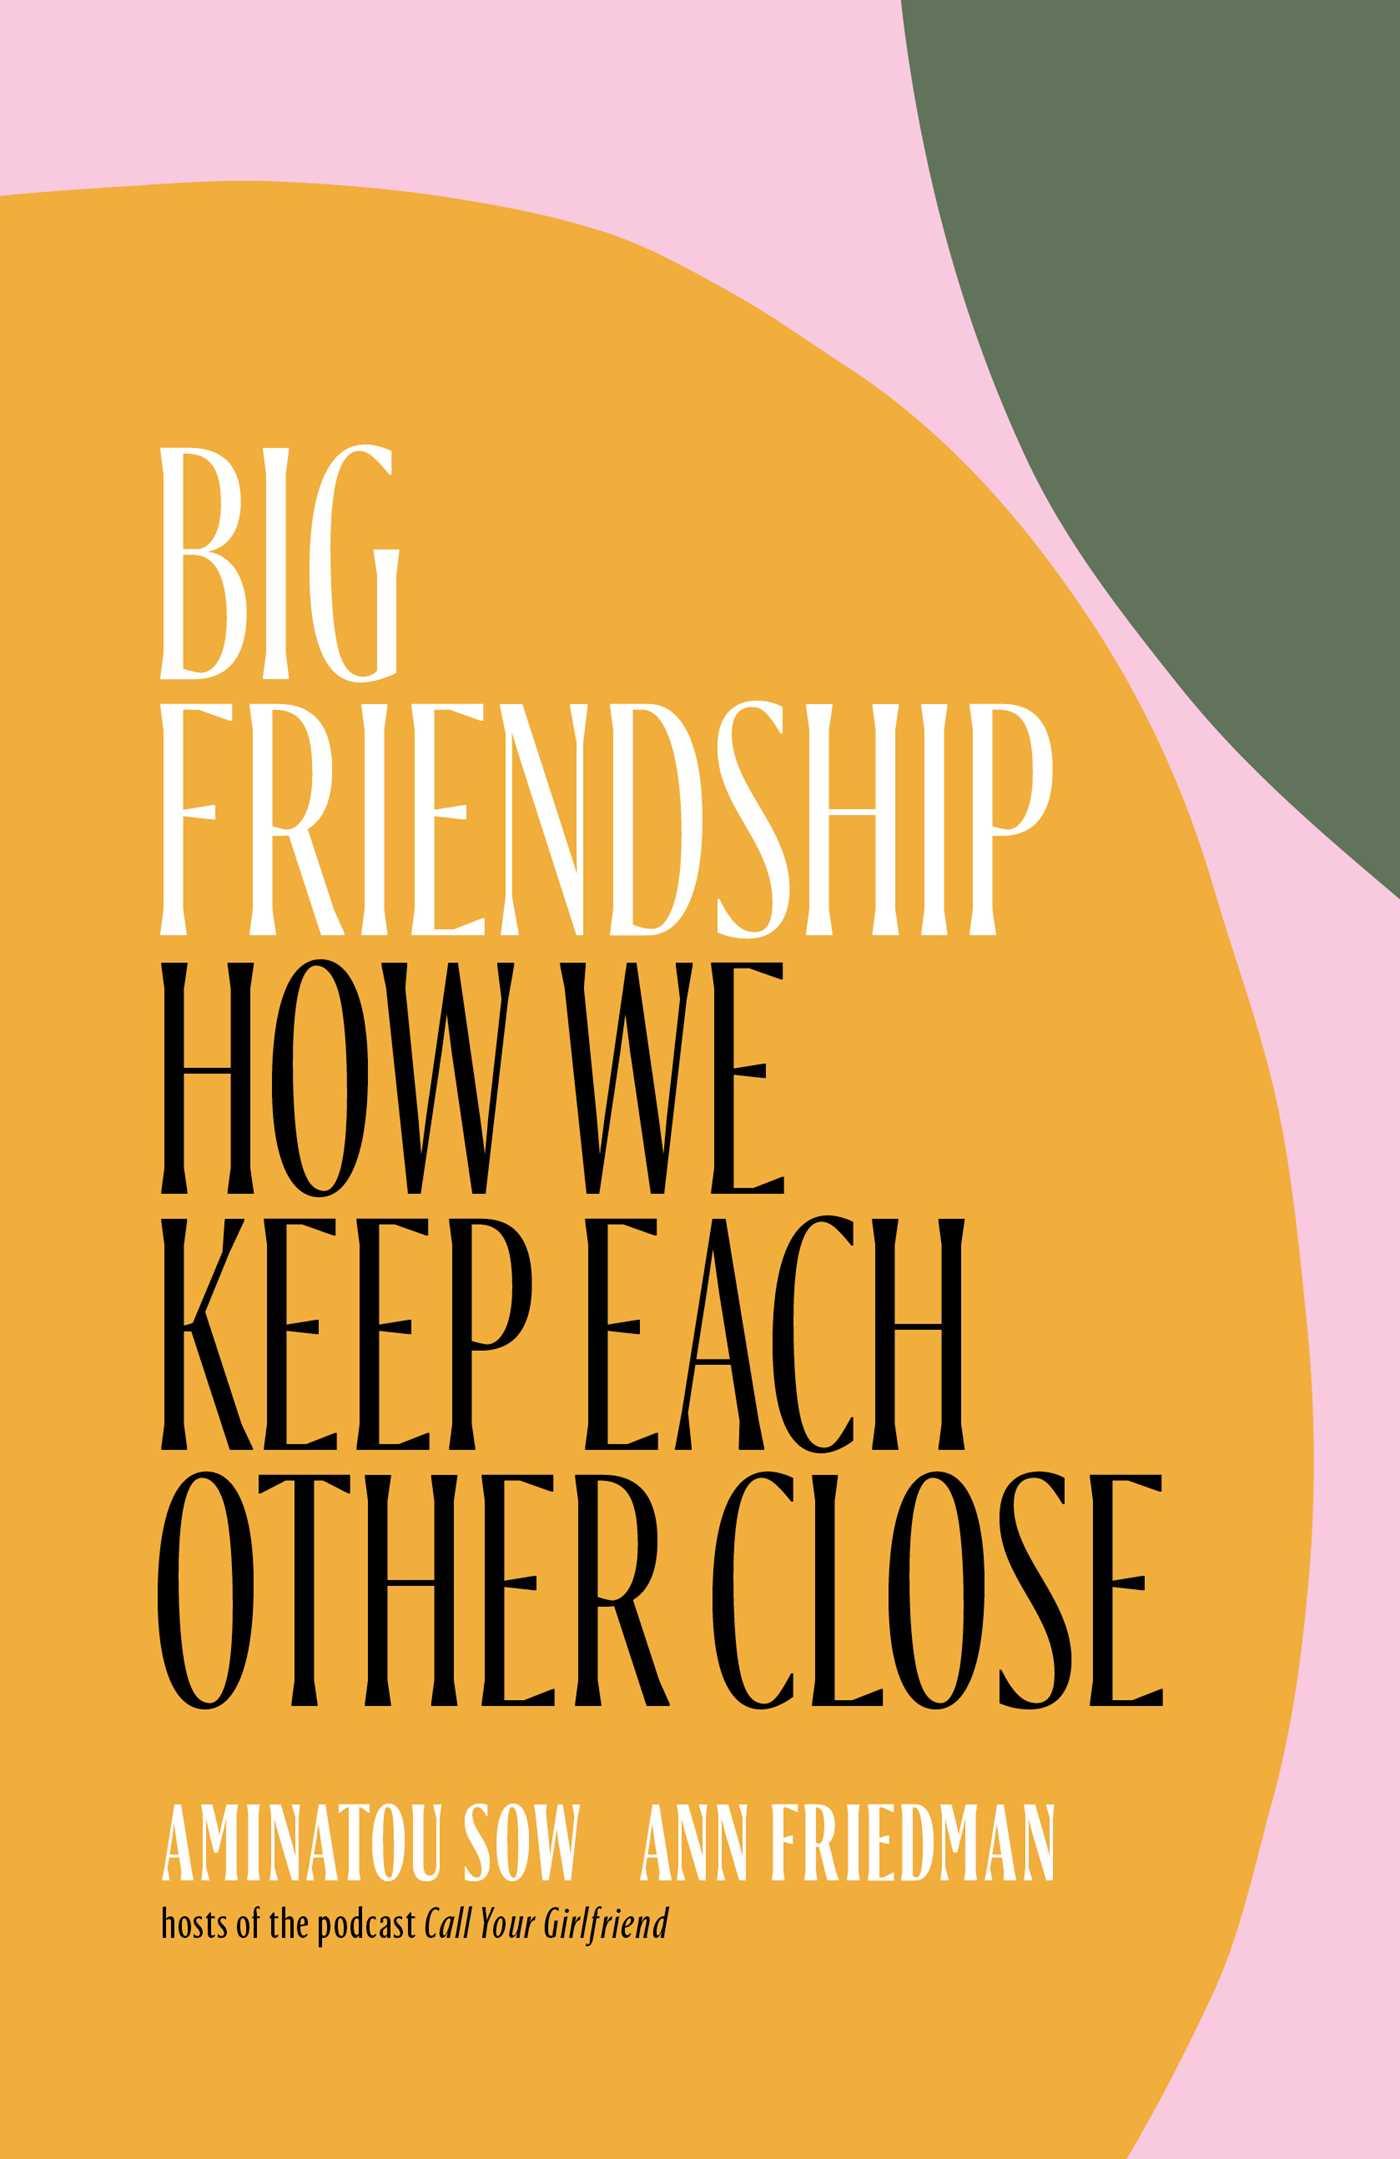 big friendship covers